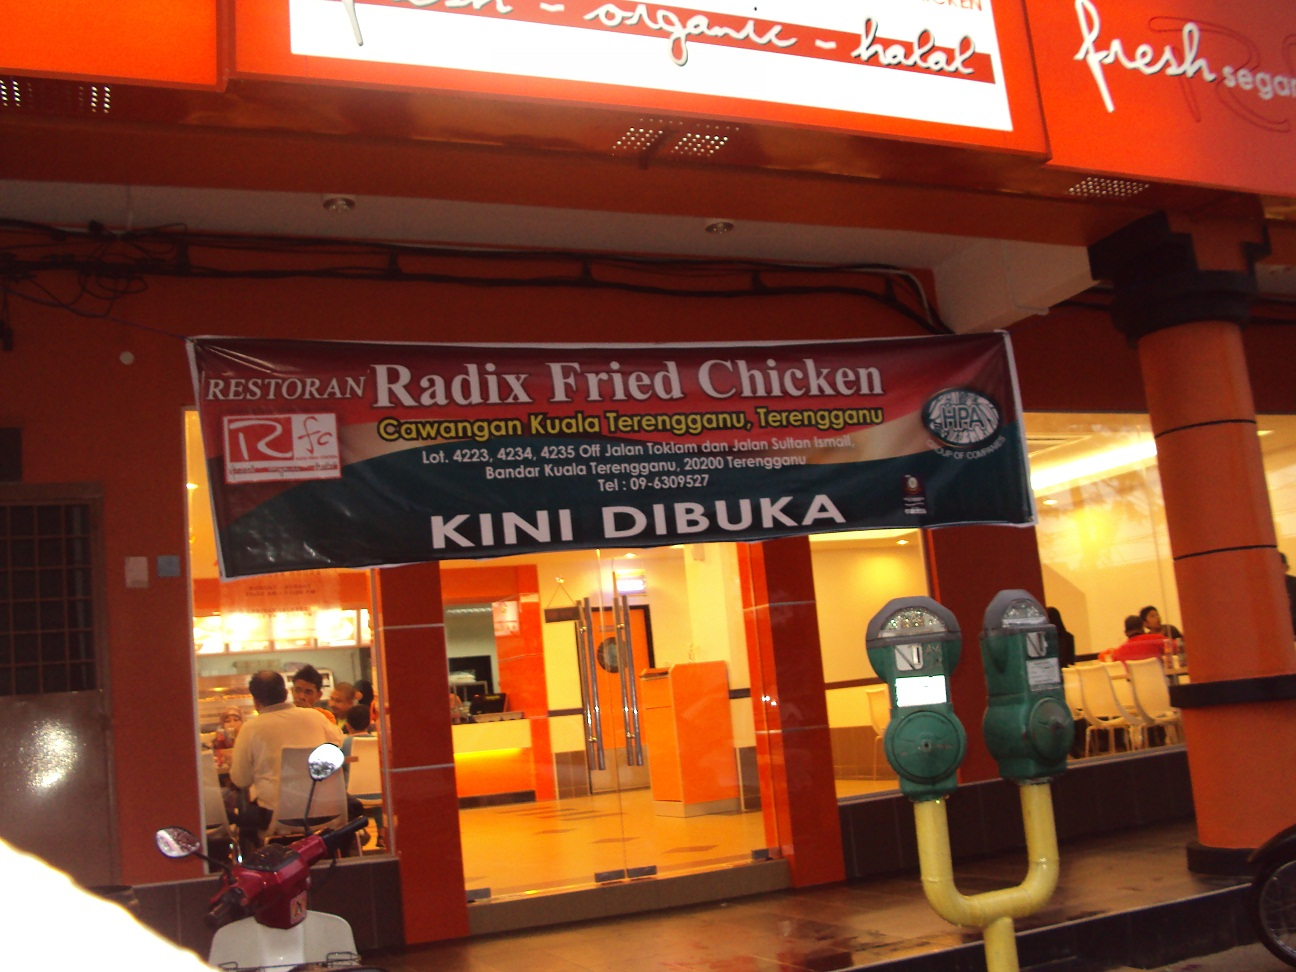 radix fried chicken background Order from rfc (rooster fried chicken) kphb online in hyderabad, 500072 | home delivery rfc (rooster fried chicken) kphb menu, ratings and reviews from rfc (rooster fried chicken) kphb restaurant hyderabad.